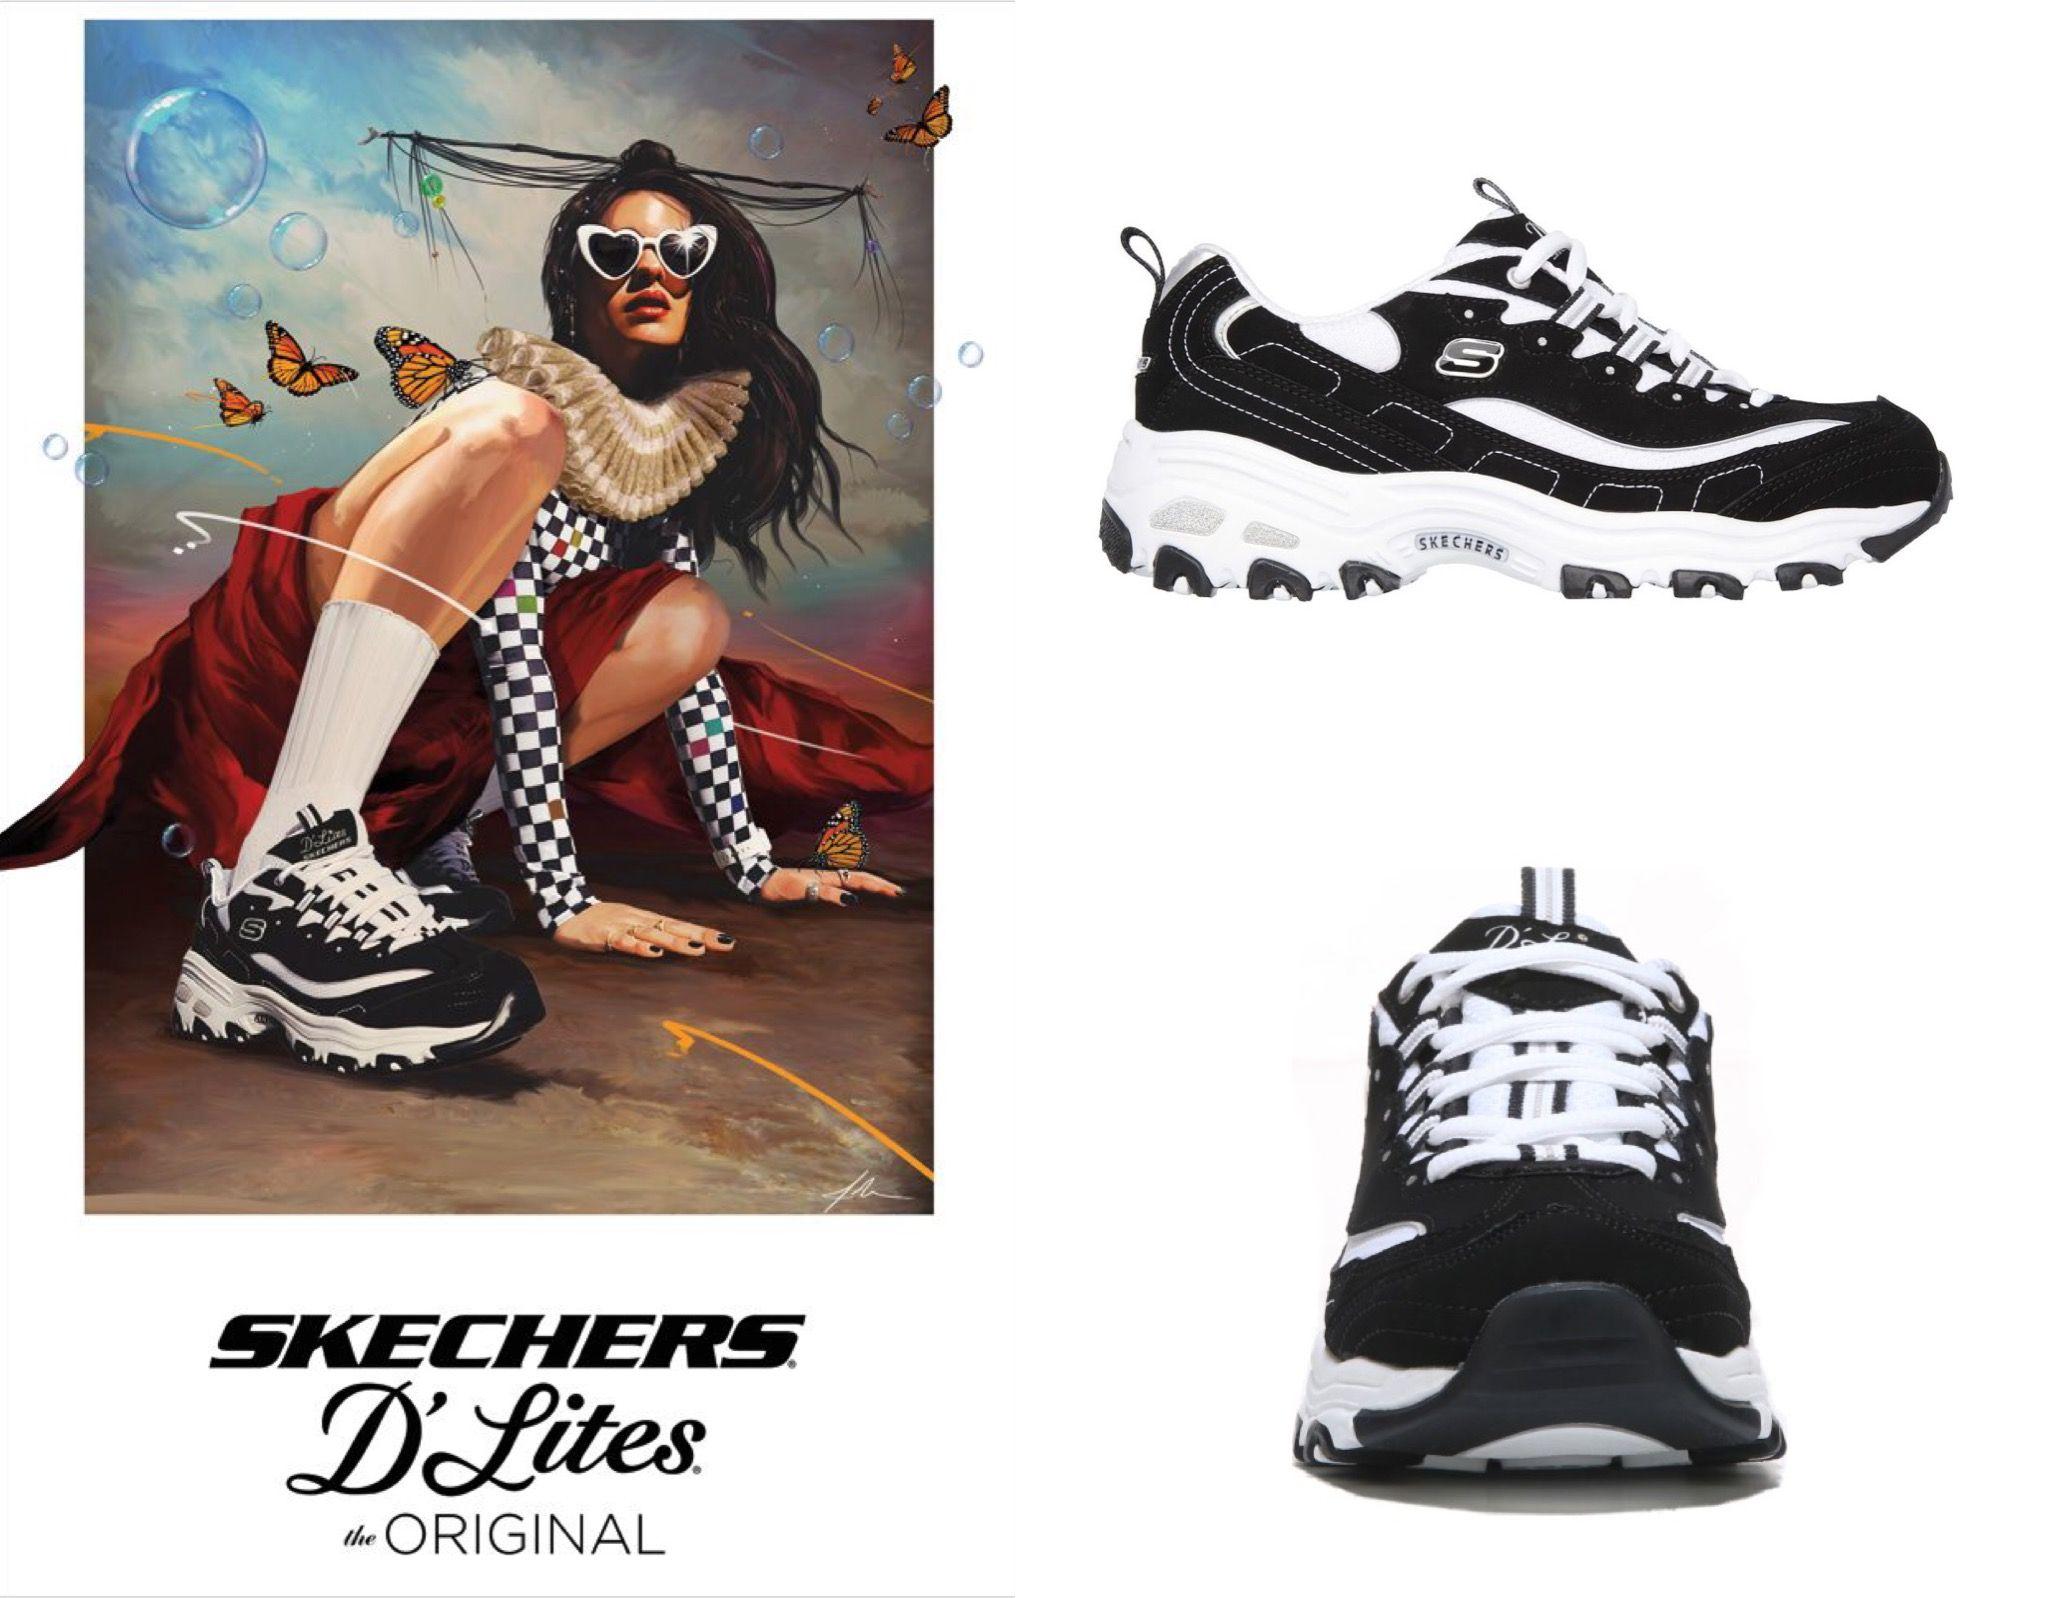 Sketchers   Fashion advertising, Skechers d lites, High top